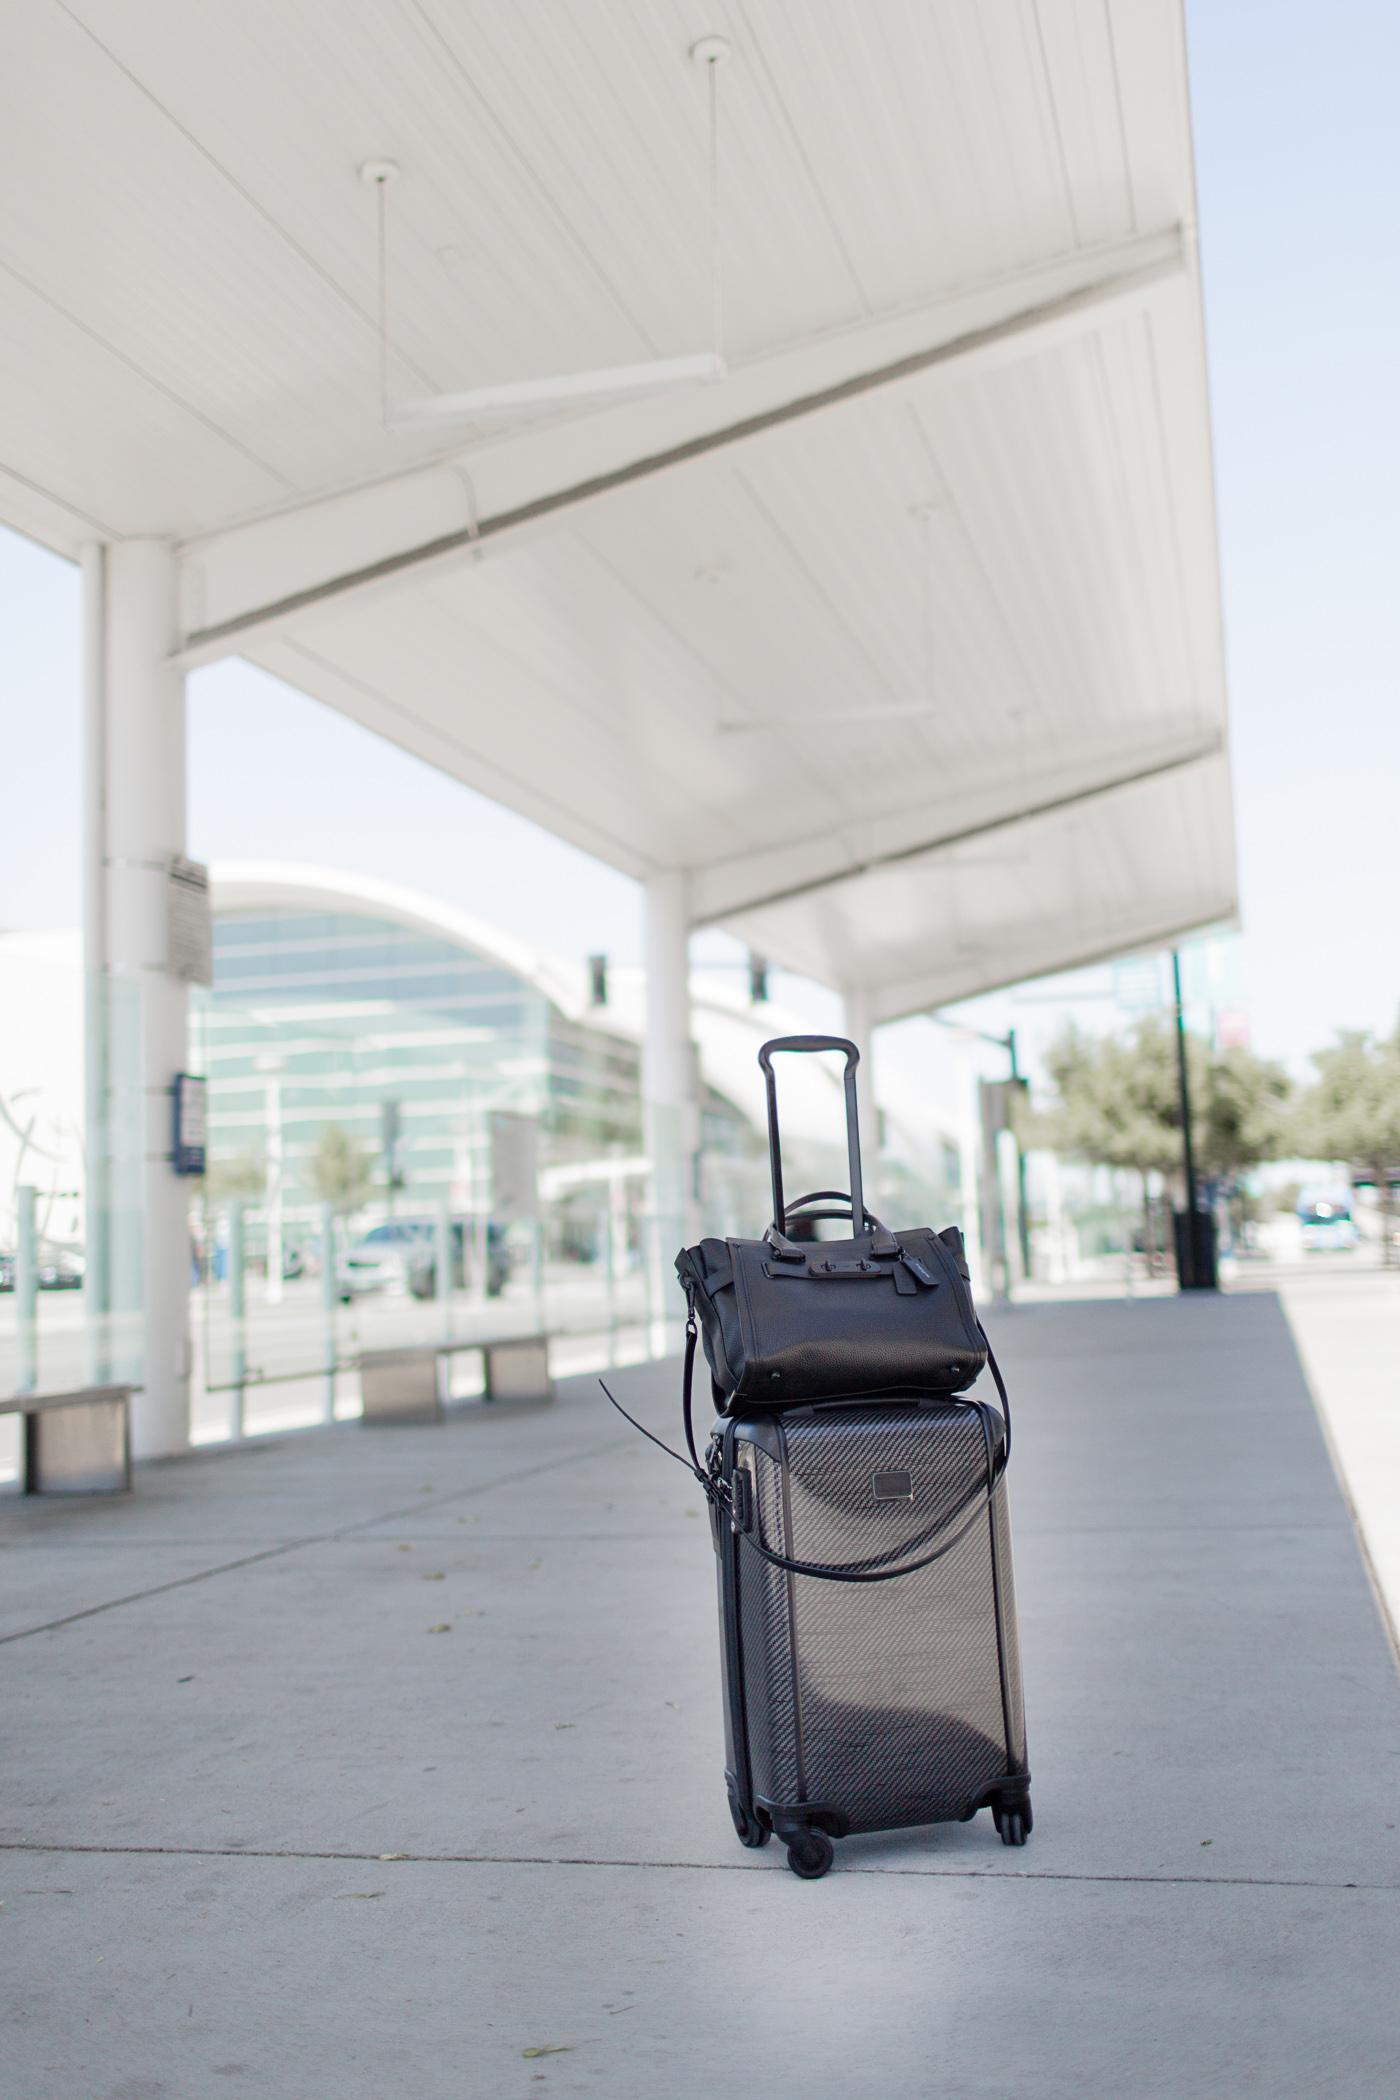 Tips to Travel Light